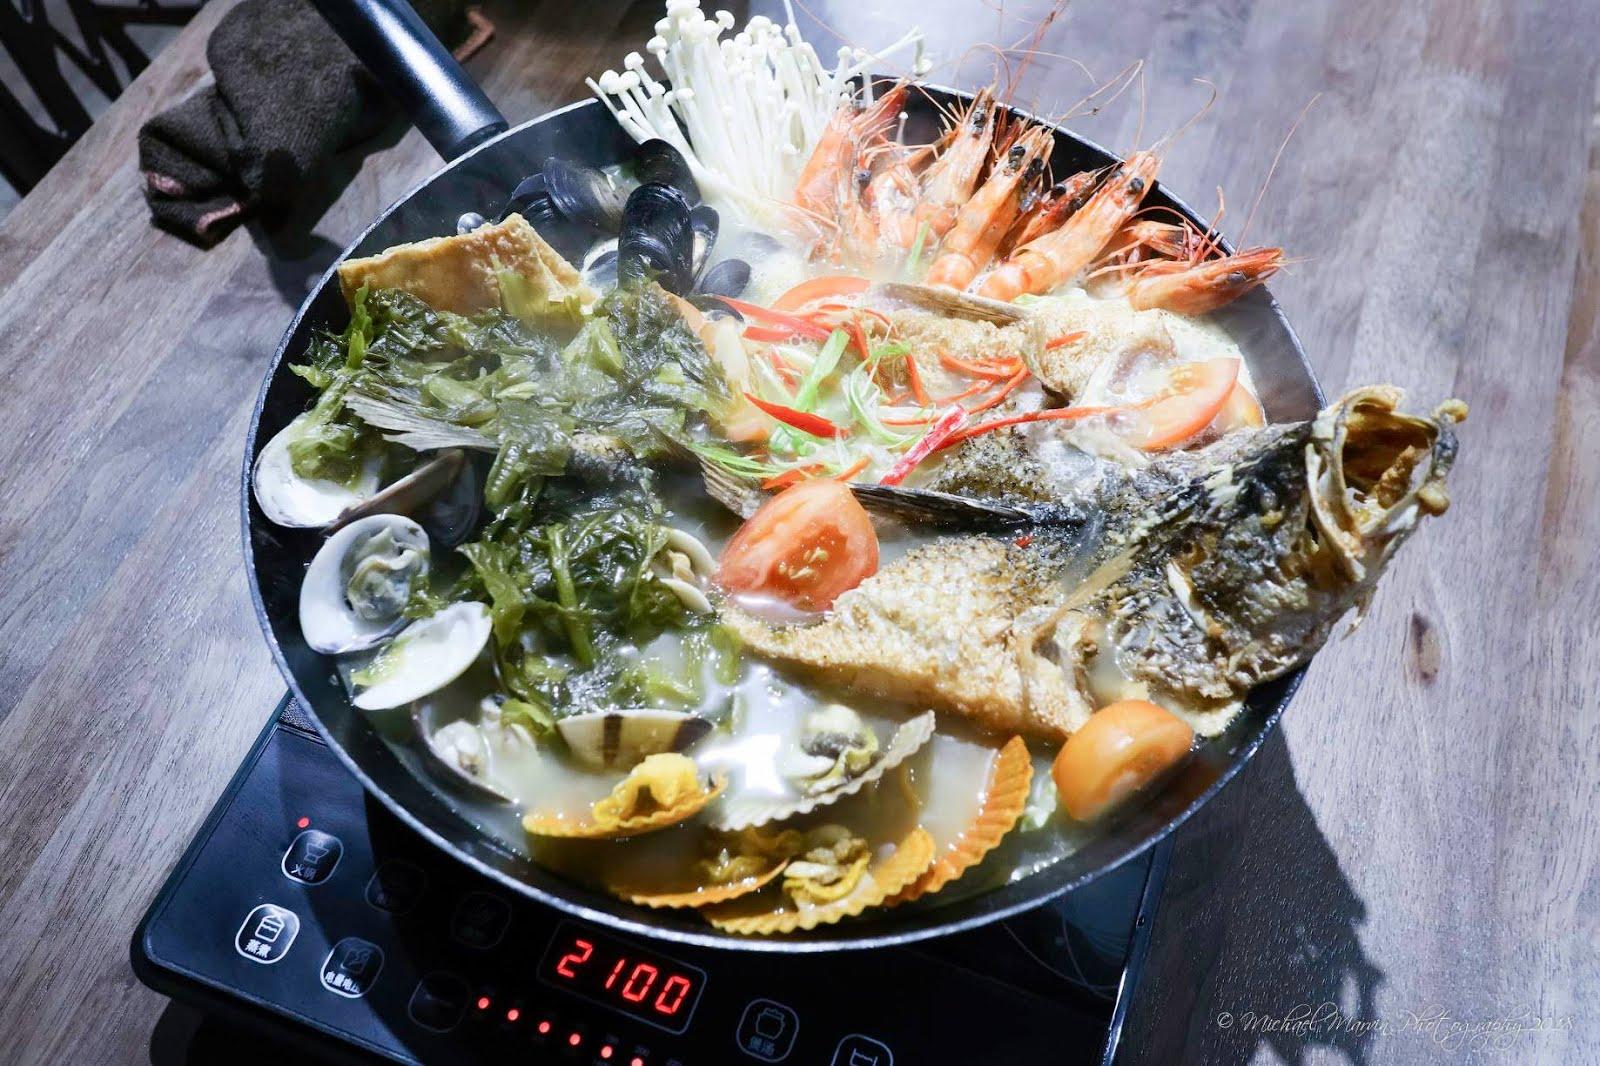 Sizzling Hot Pot Weymouth